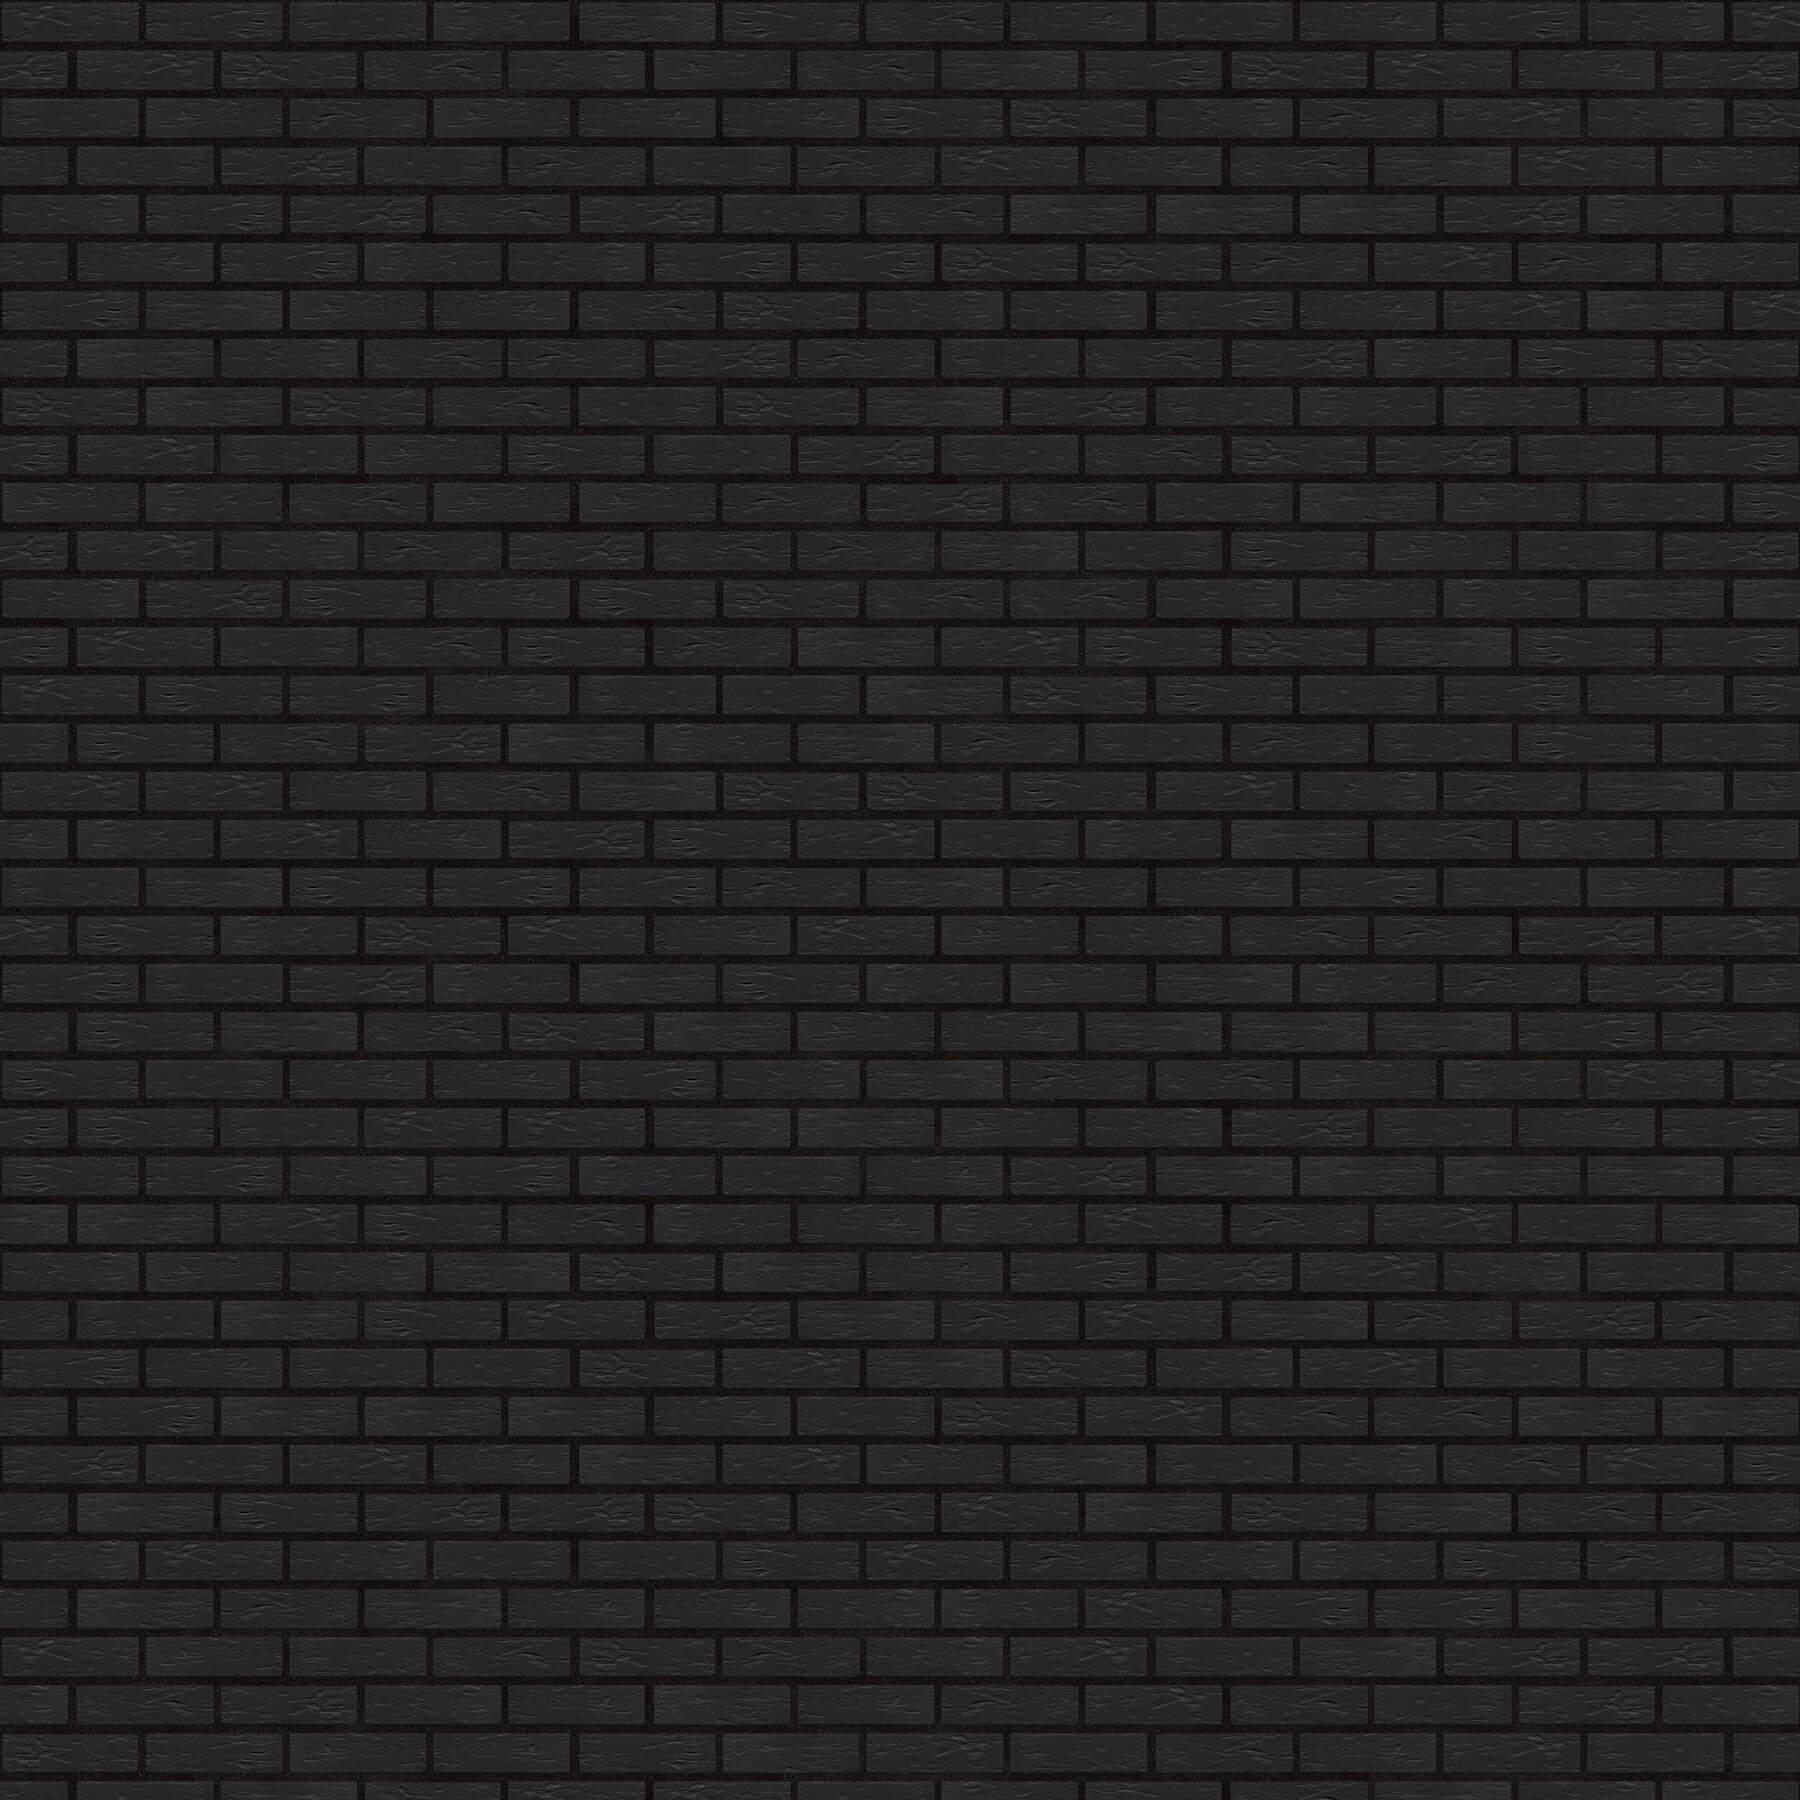 Dekorativna cigla listela FeldHaus Klinker r-740 nf Antracit Fuga